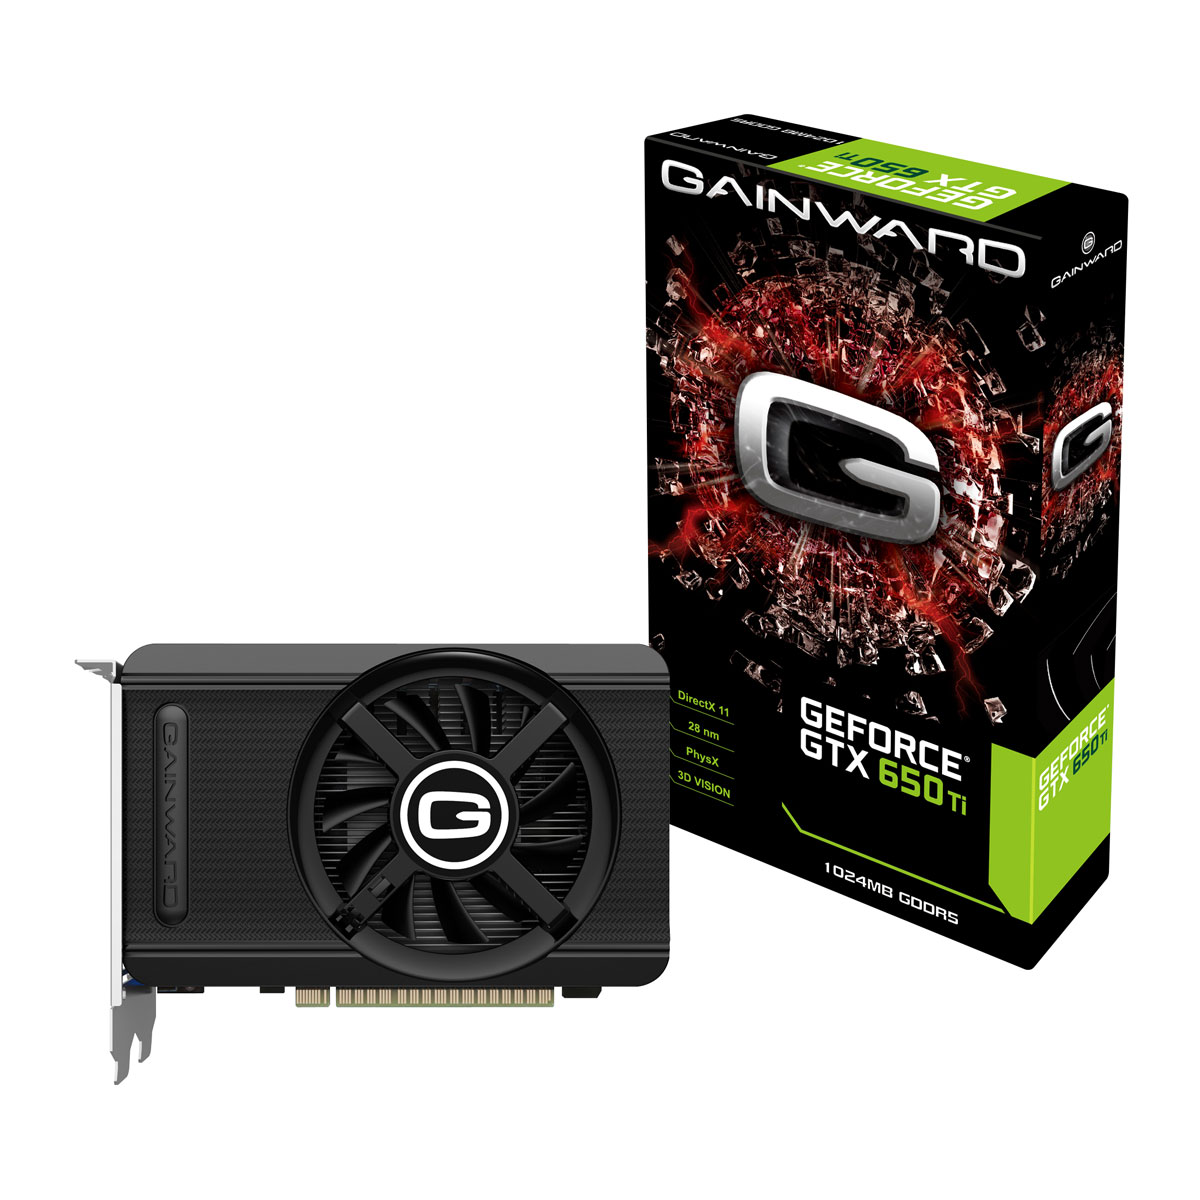 Carte graphique Gainward GeForce GTX 650 Ti 1 GB 1024 Mo DVI/Mini HDMI - PCI Express (NVIDIA GeForce avec CUDA GTX 650 Ti)